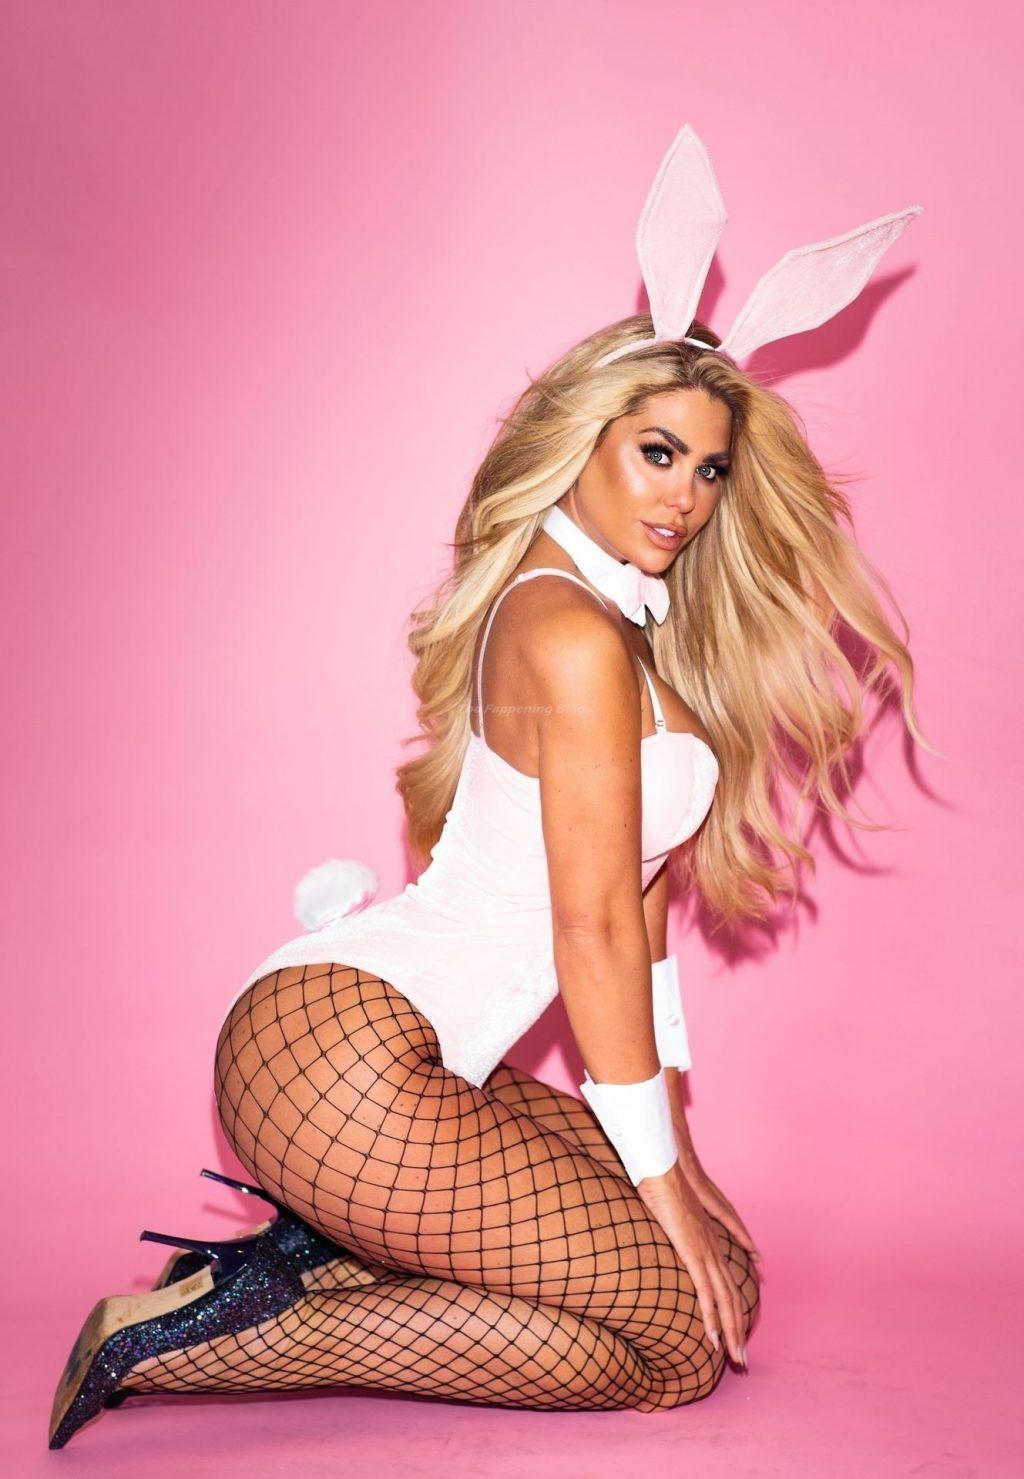 Bianca Gascoigne Strips Down to a Bunny Costume (12 Photos)